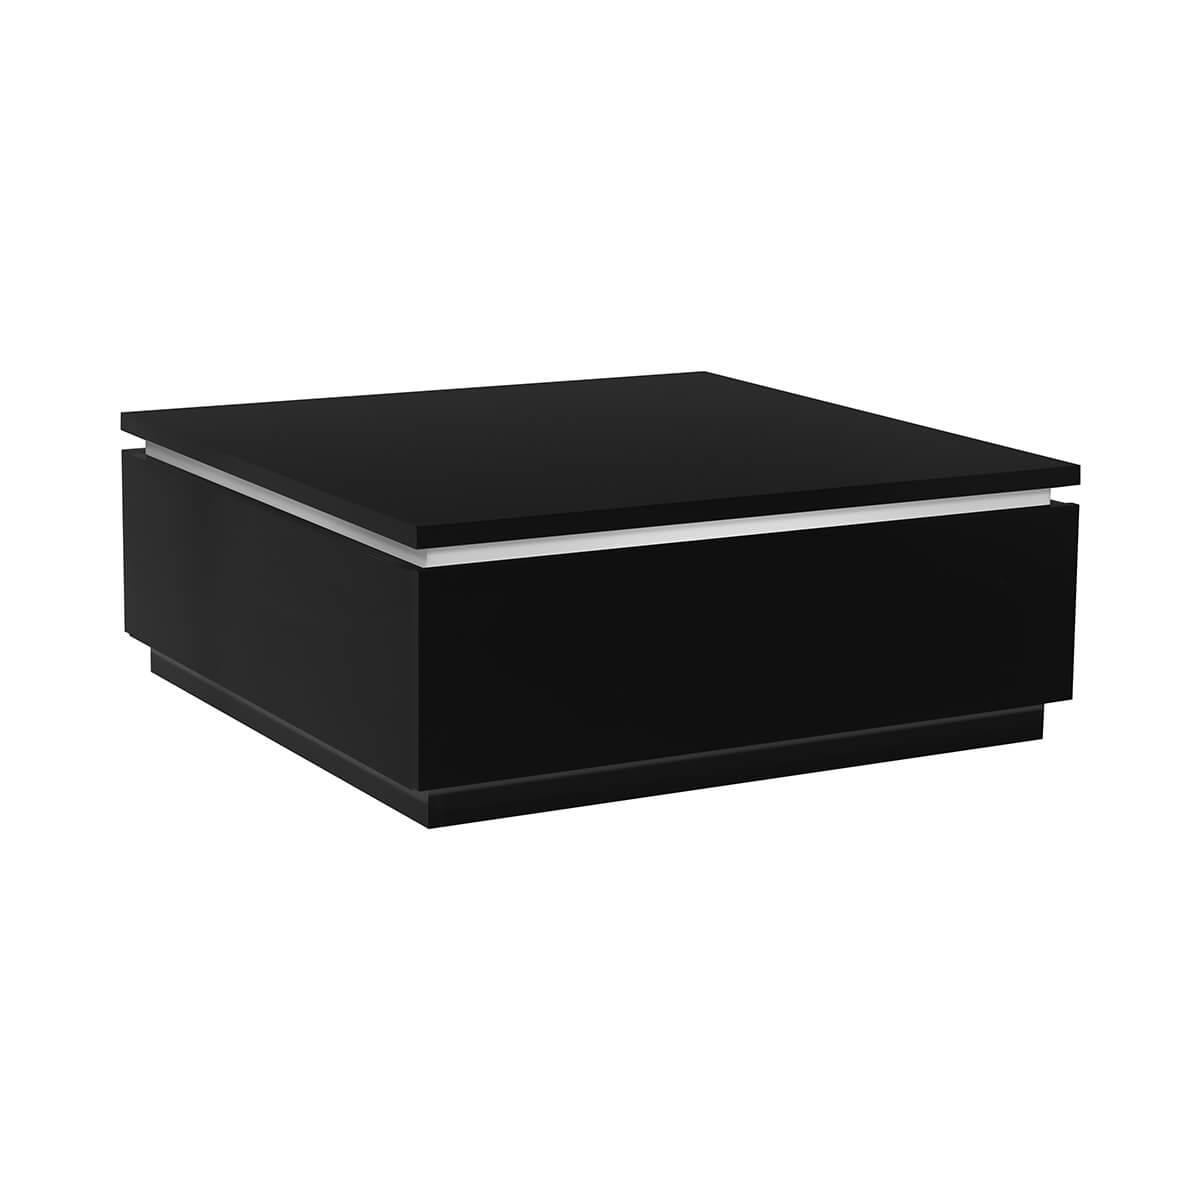 logan coffee table black high gloss with lights storage